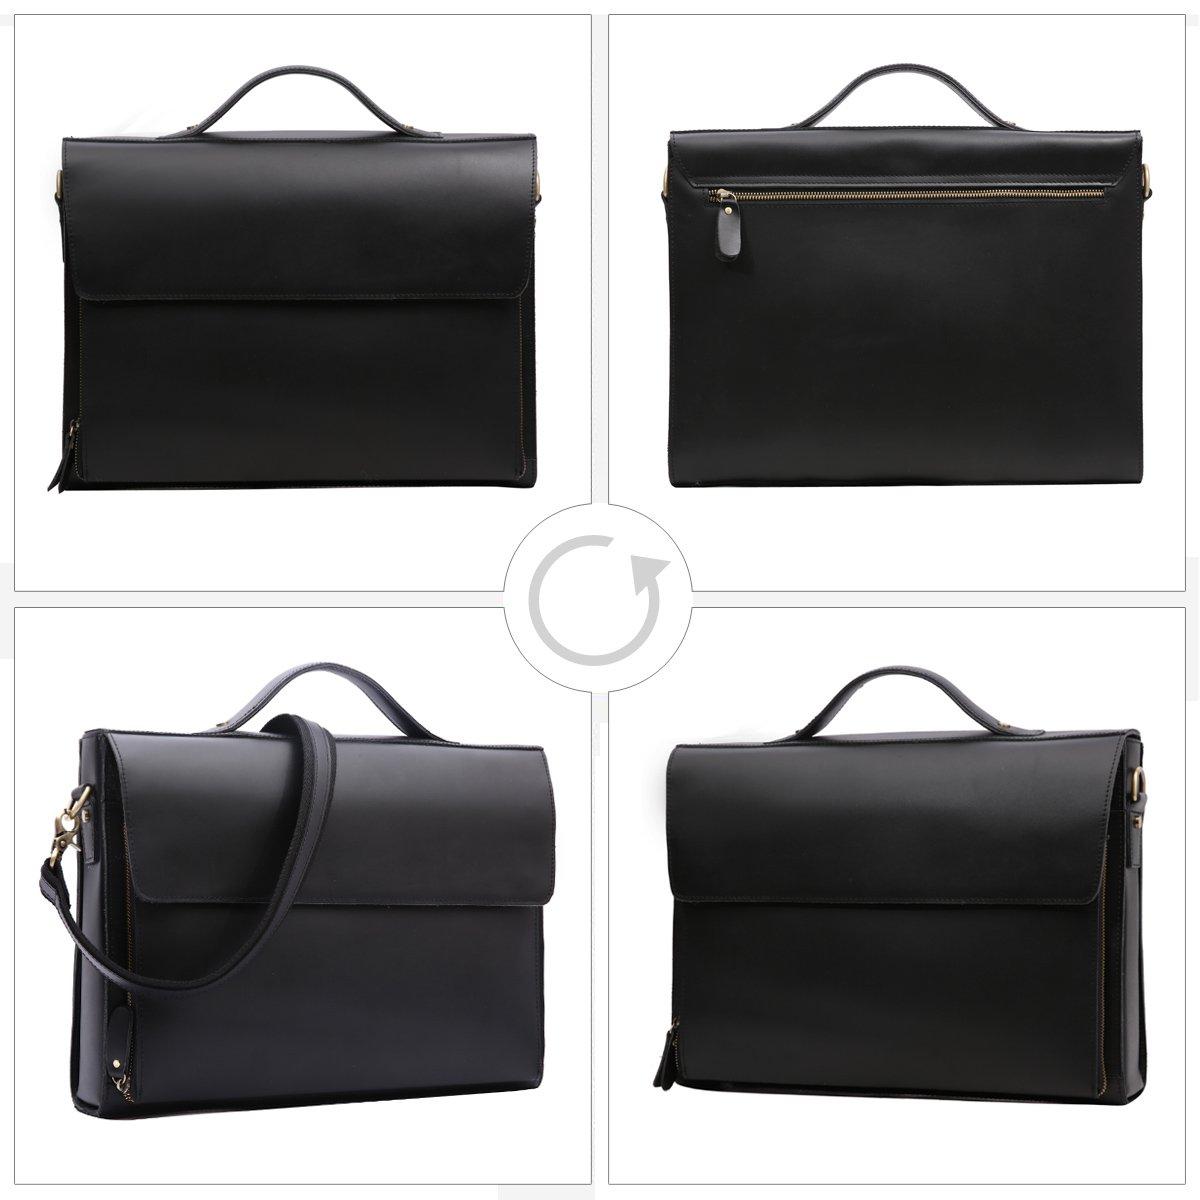 Leathario Leather Briefcase for Men Leather Laptop Bag Shoulder Messenger Bag Business Work Bag by Leathario (Image #2)